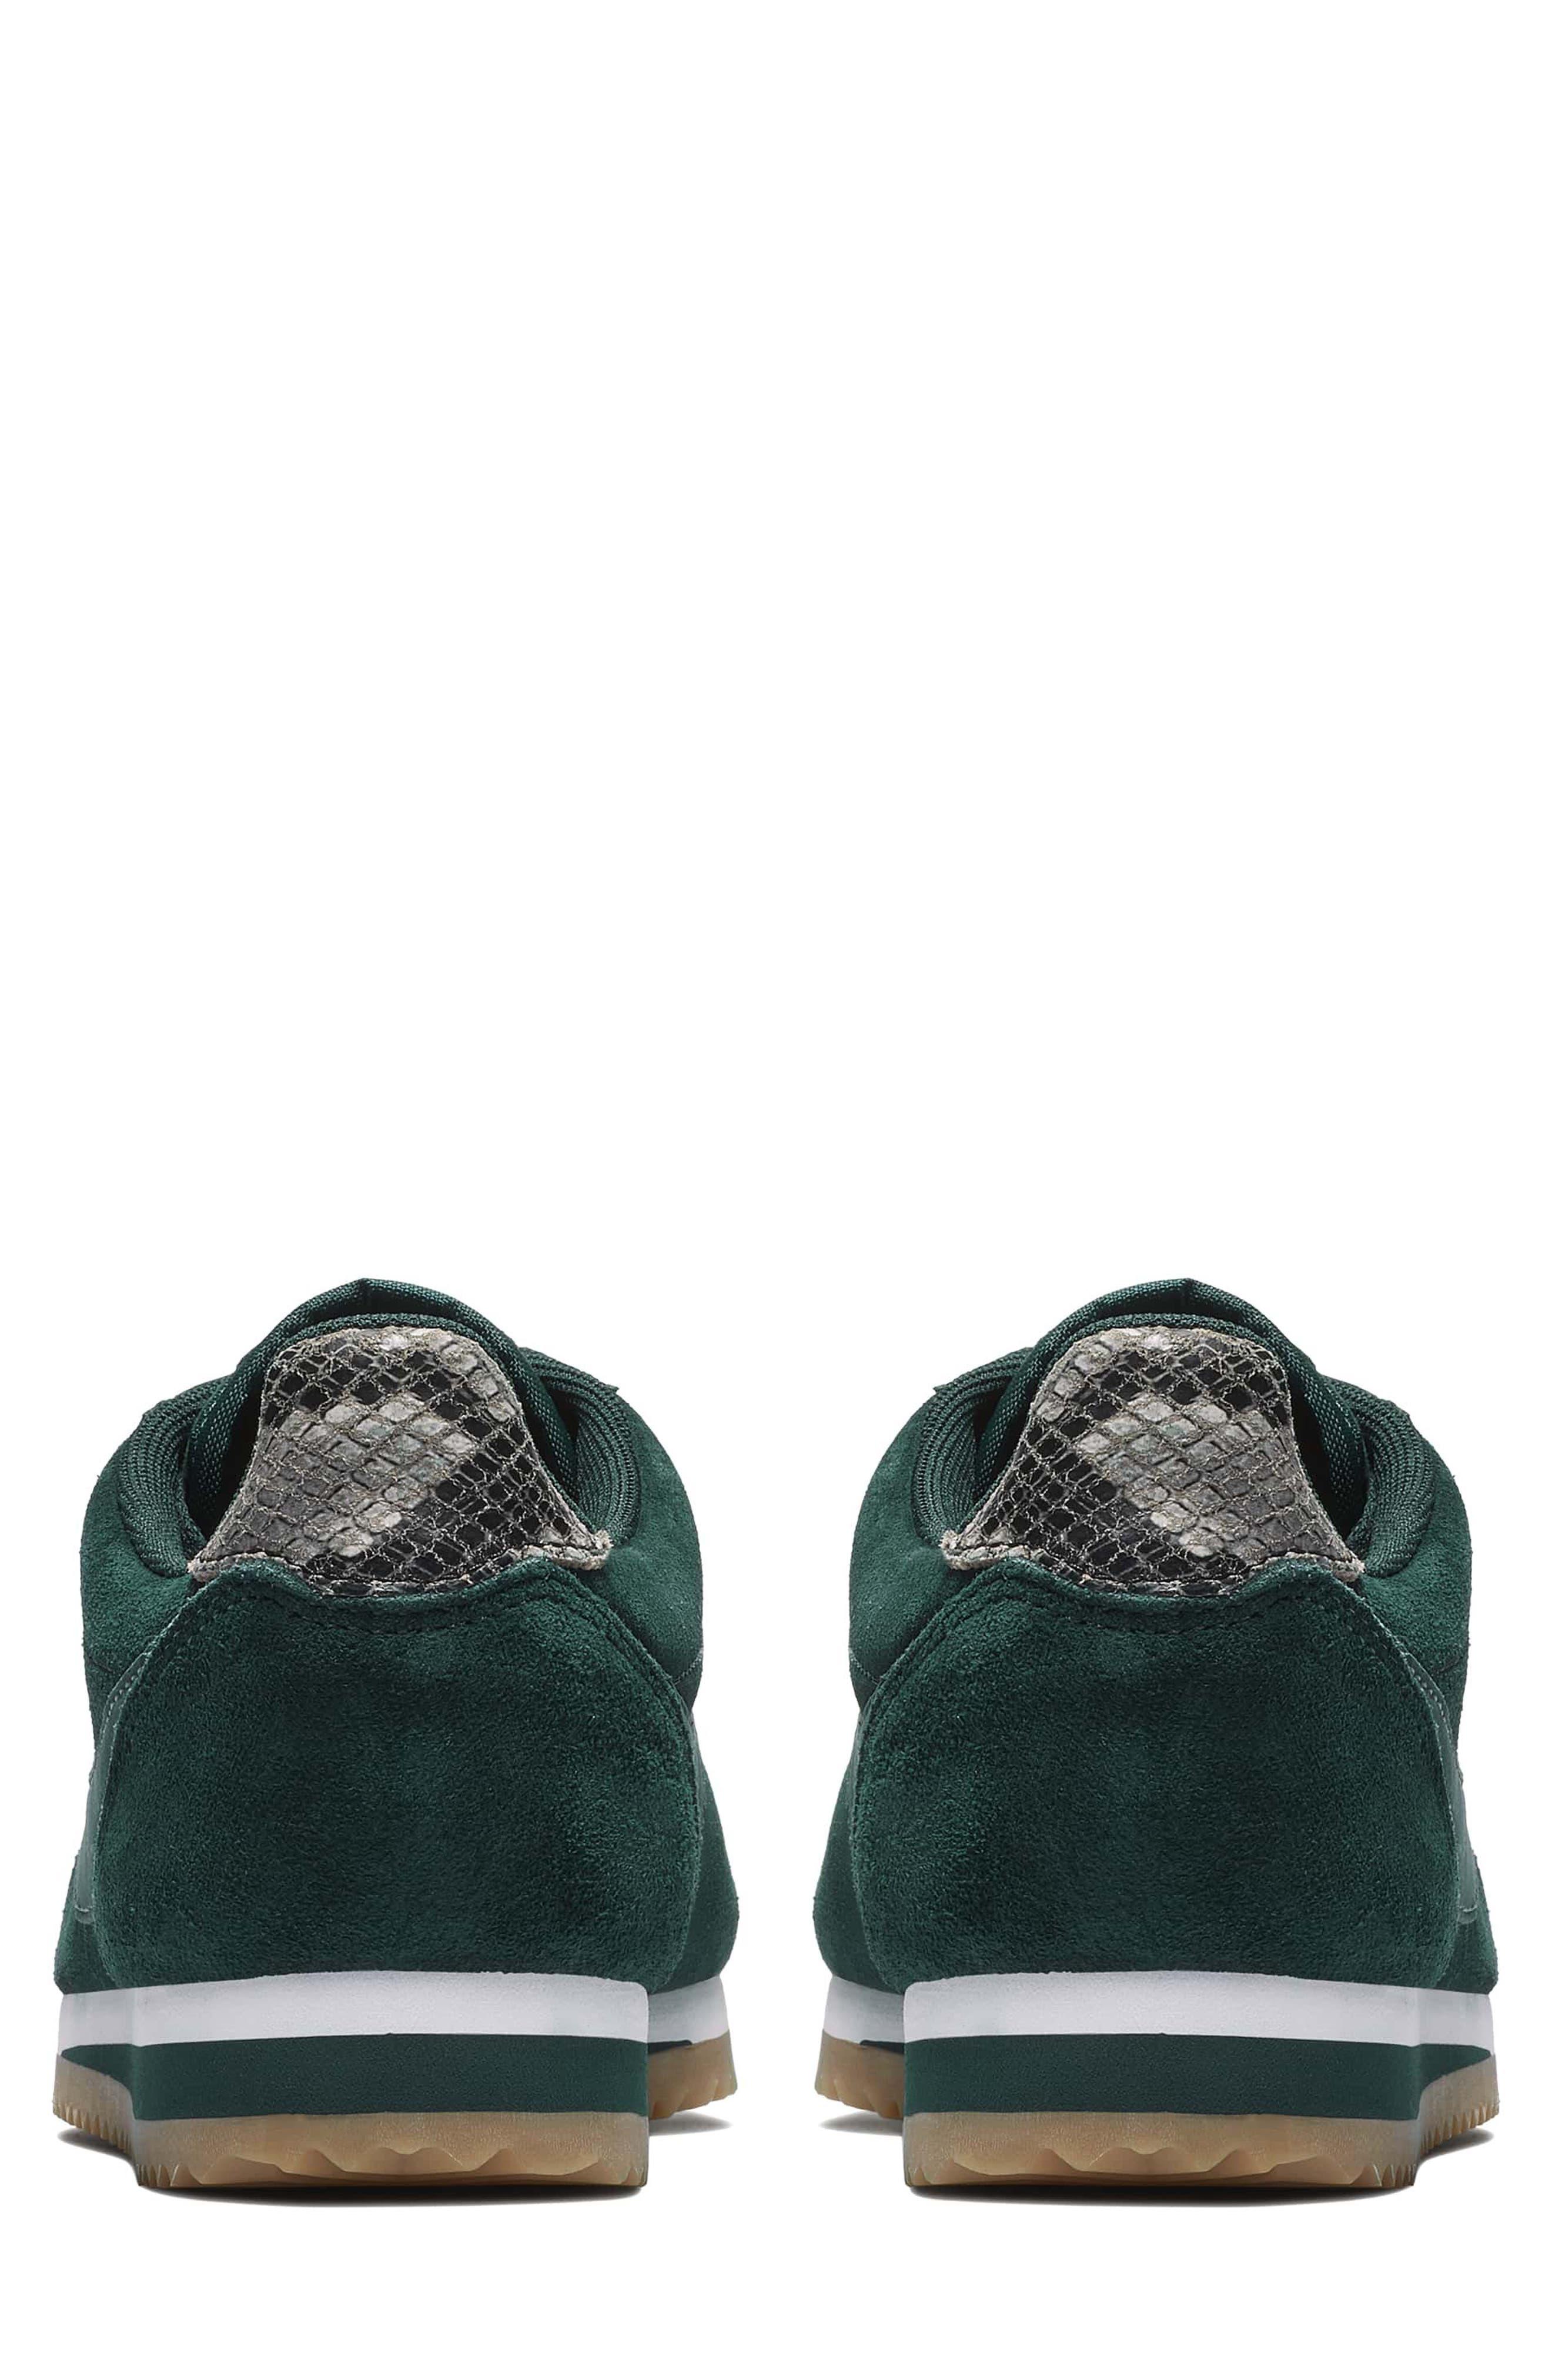 x A.L.C. Classic Cortez Sneaker,                             Alternate thumbnail 2, color,                             Midnight Spruce/ White